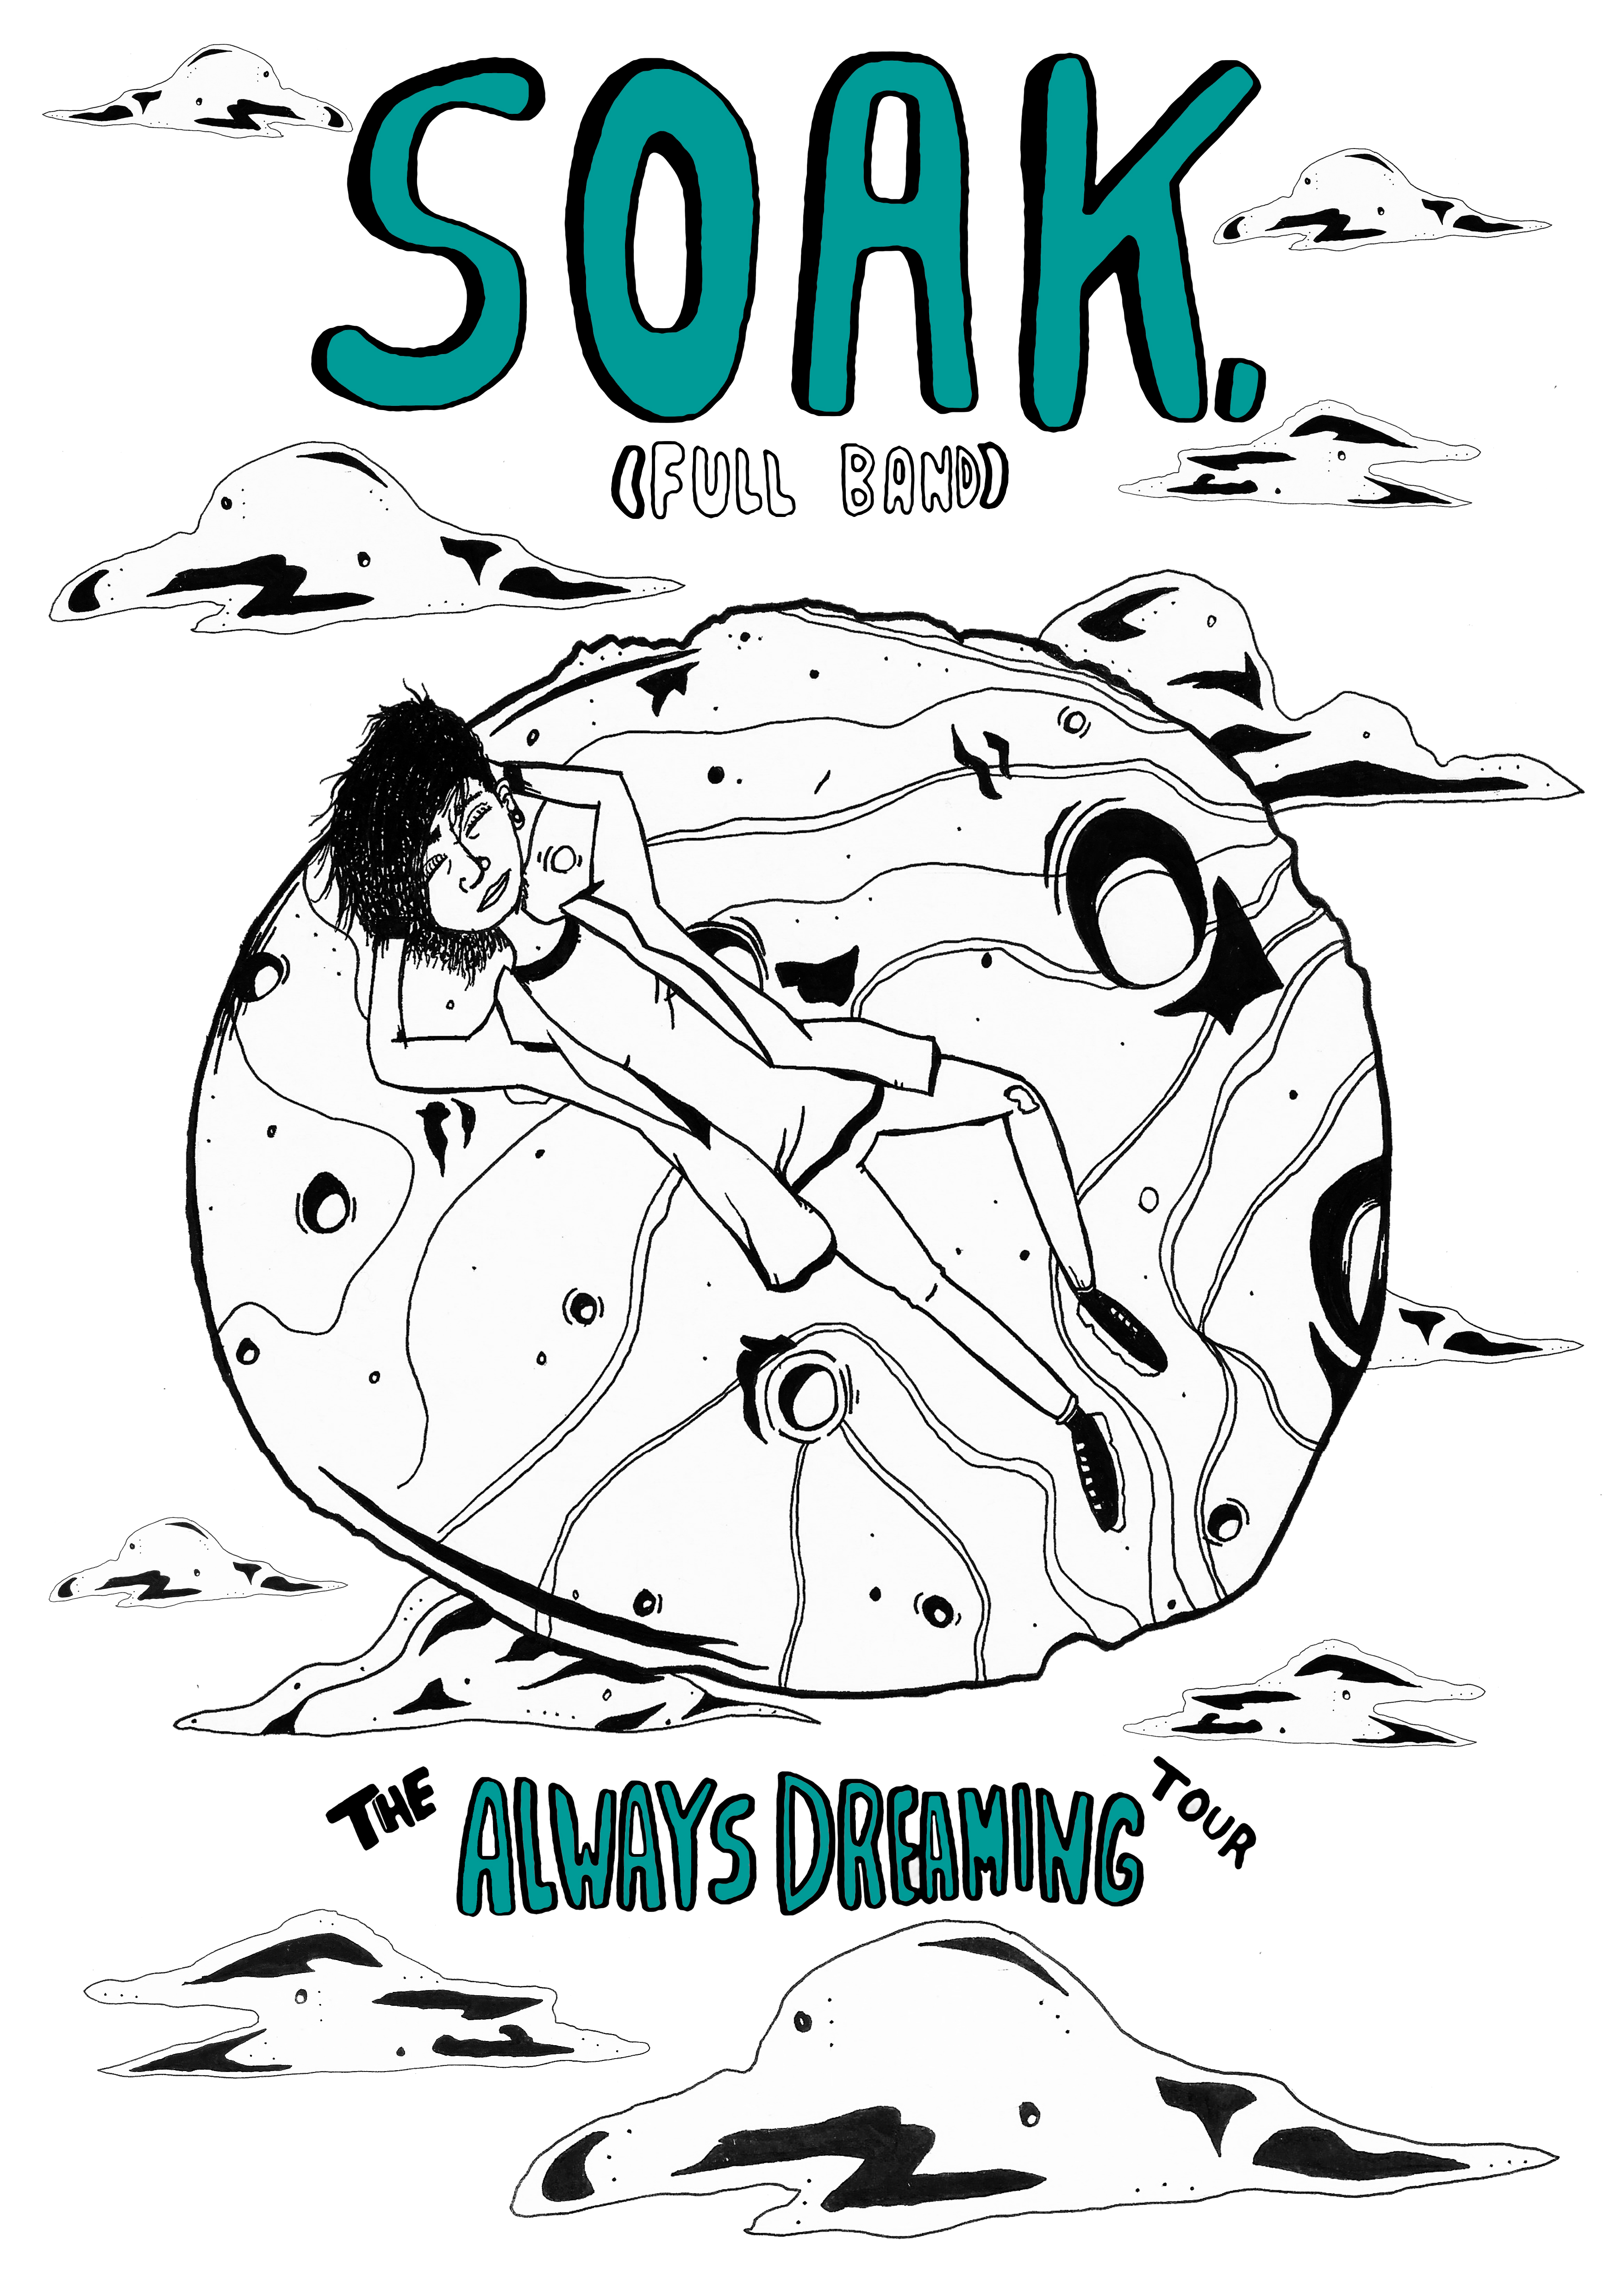 Always Dreaming Tour Poster - SOAK